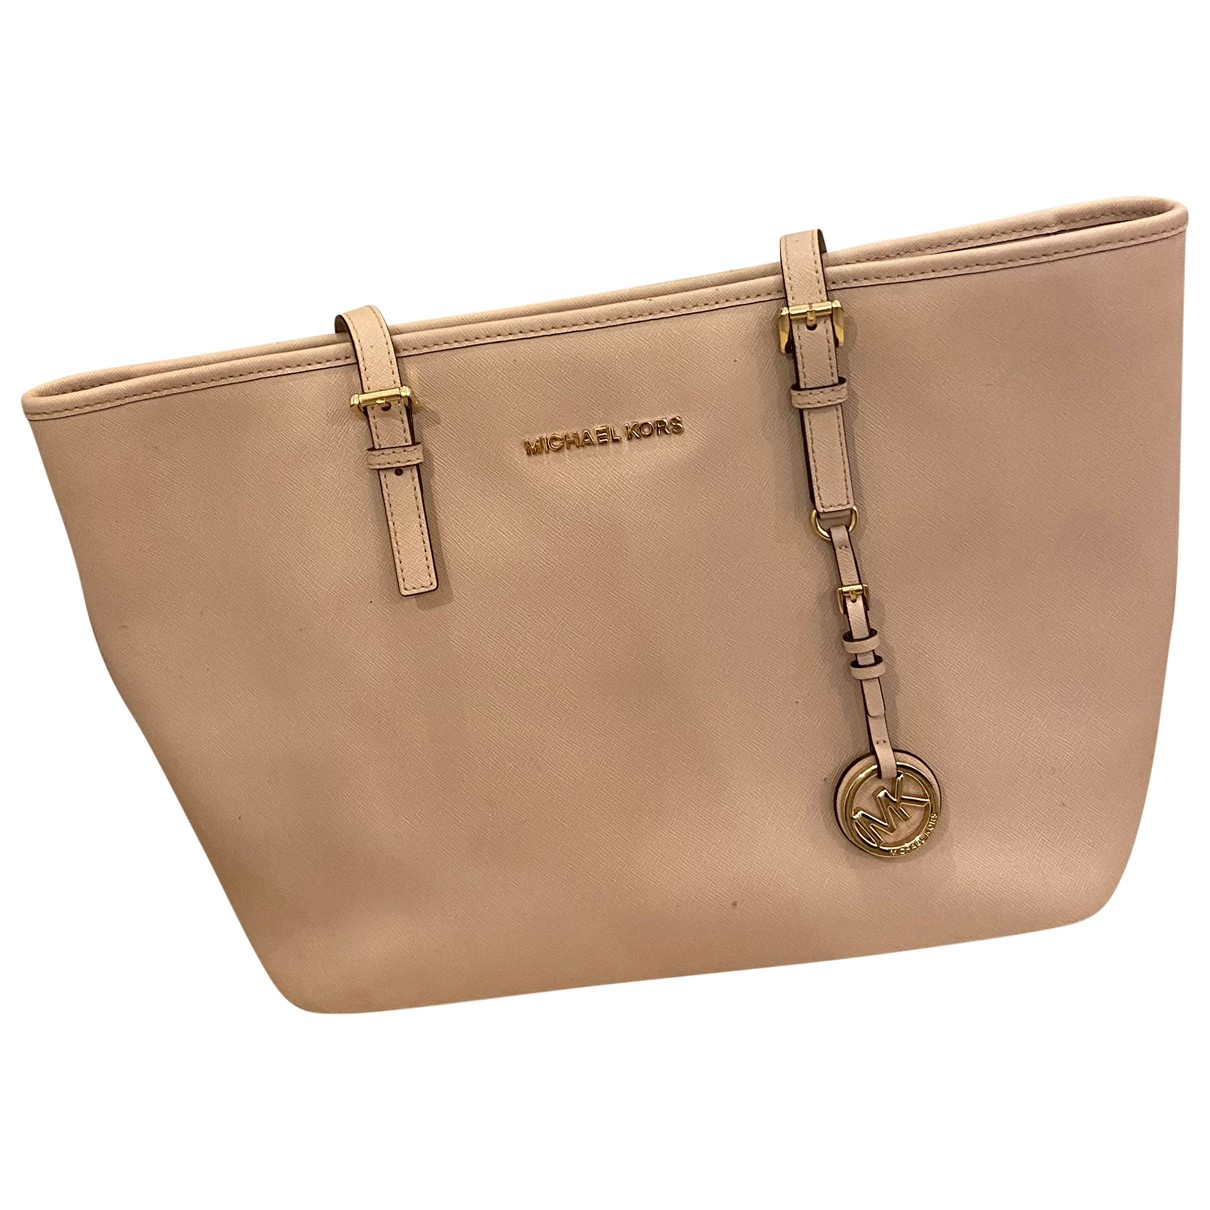 Michael Kors Jet Set Pink Leather handbag for Women N